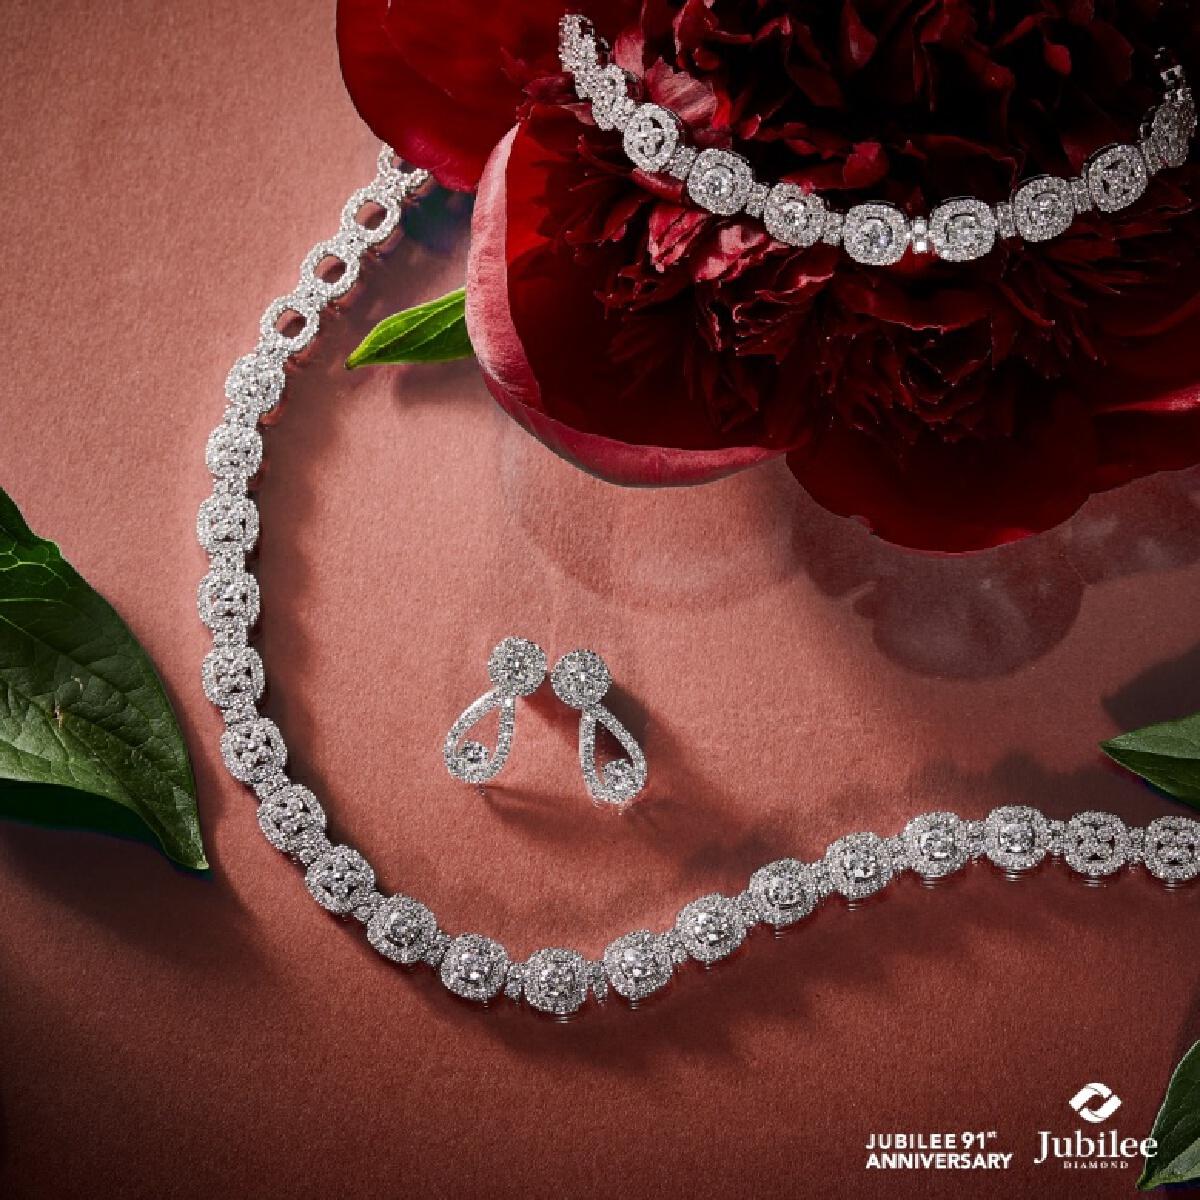 Jubilee Diamond แนะวิธีเลือกเครื่องประดับเพชรอย่างไรให้โดนใจทั้งผู้ให้และผู้รับ